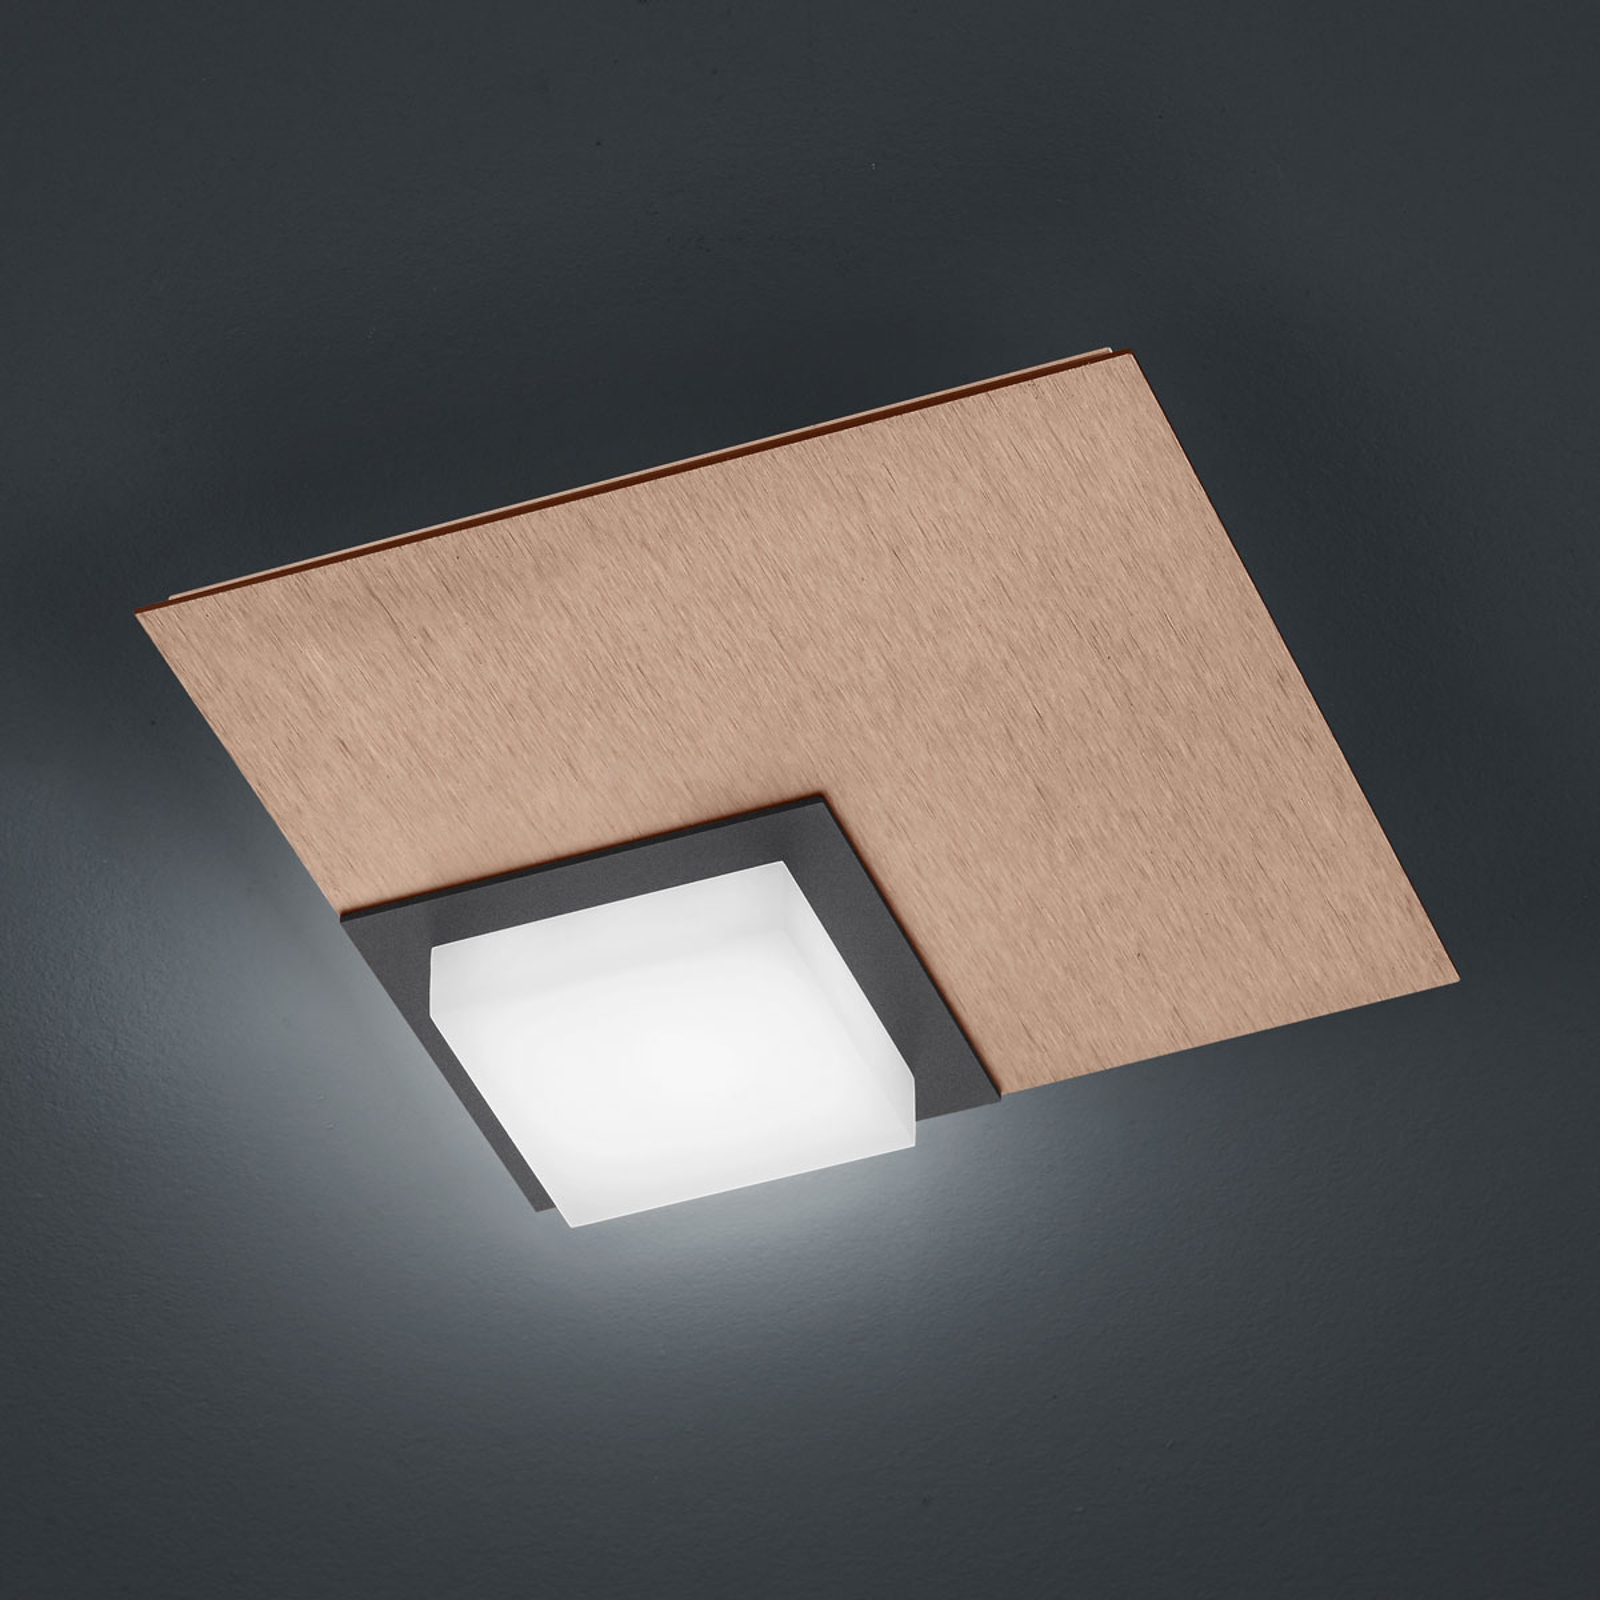 BANKAMP Quadro plafonnier LED 8W or rose